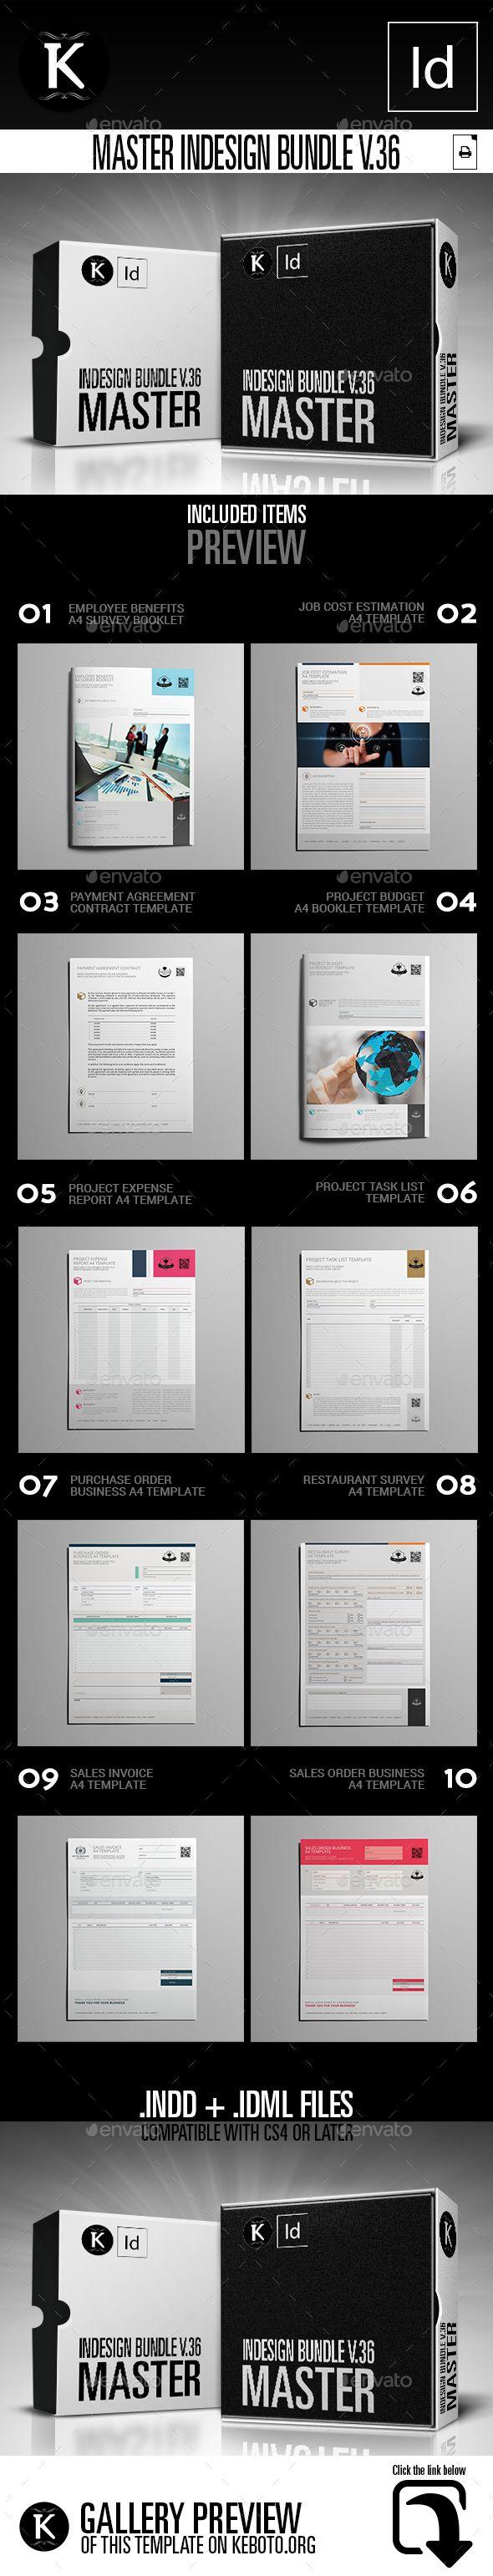 Mejores Imágenes De Templates En Pinterest Fuentes - Employee benefits booklet template